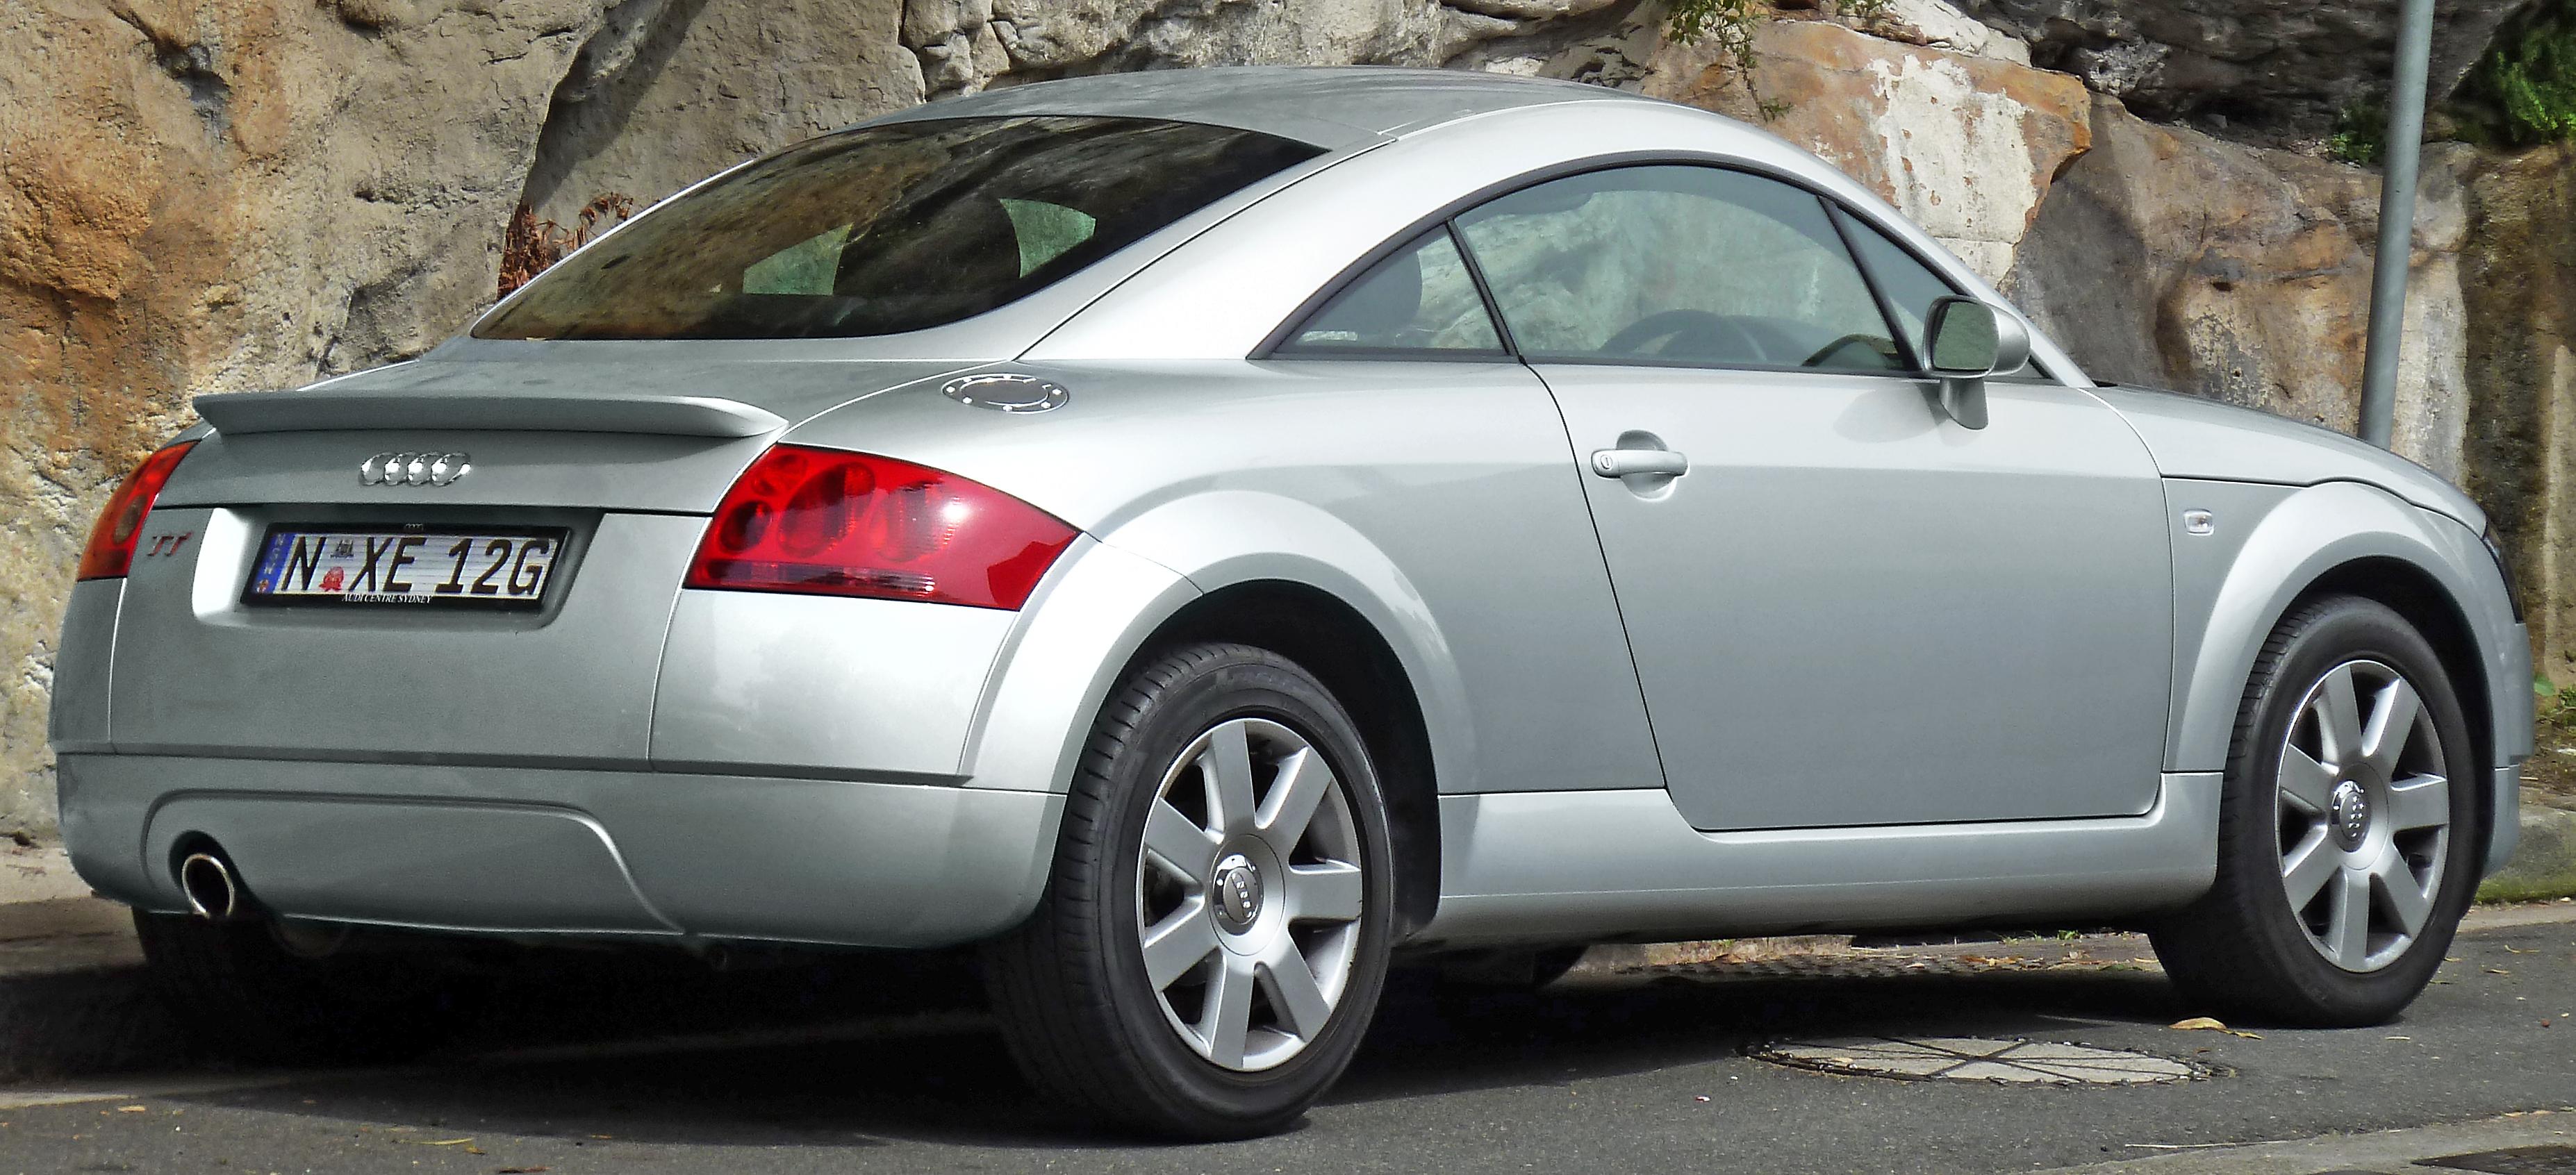 Audi TT 2006 Photo - 1